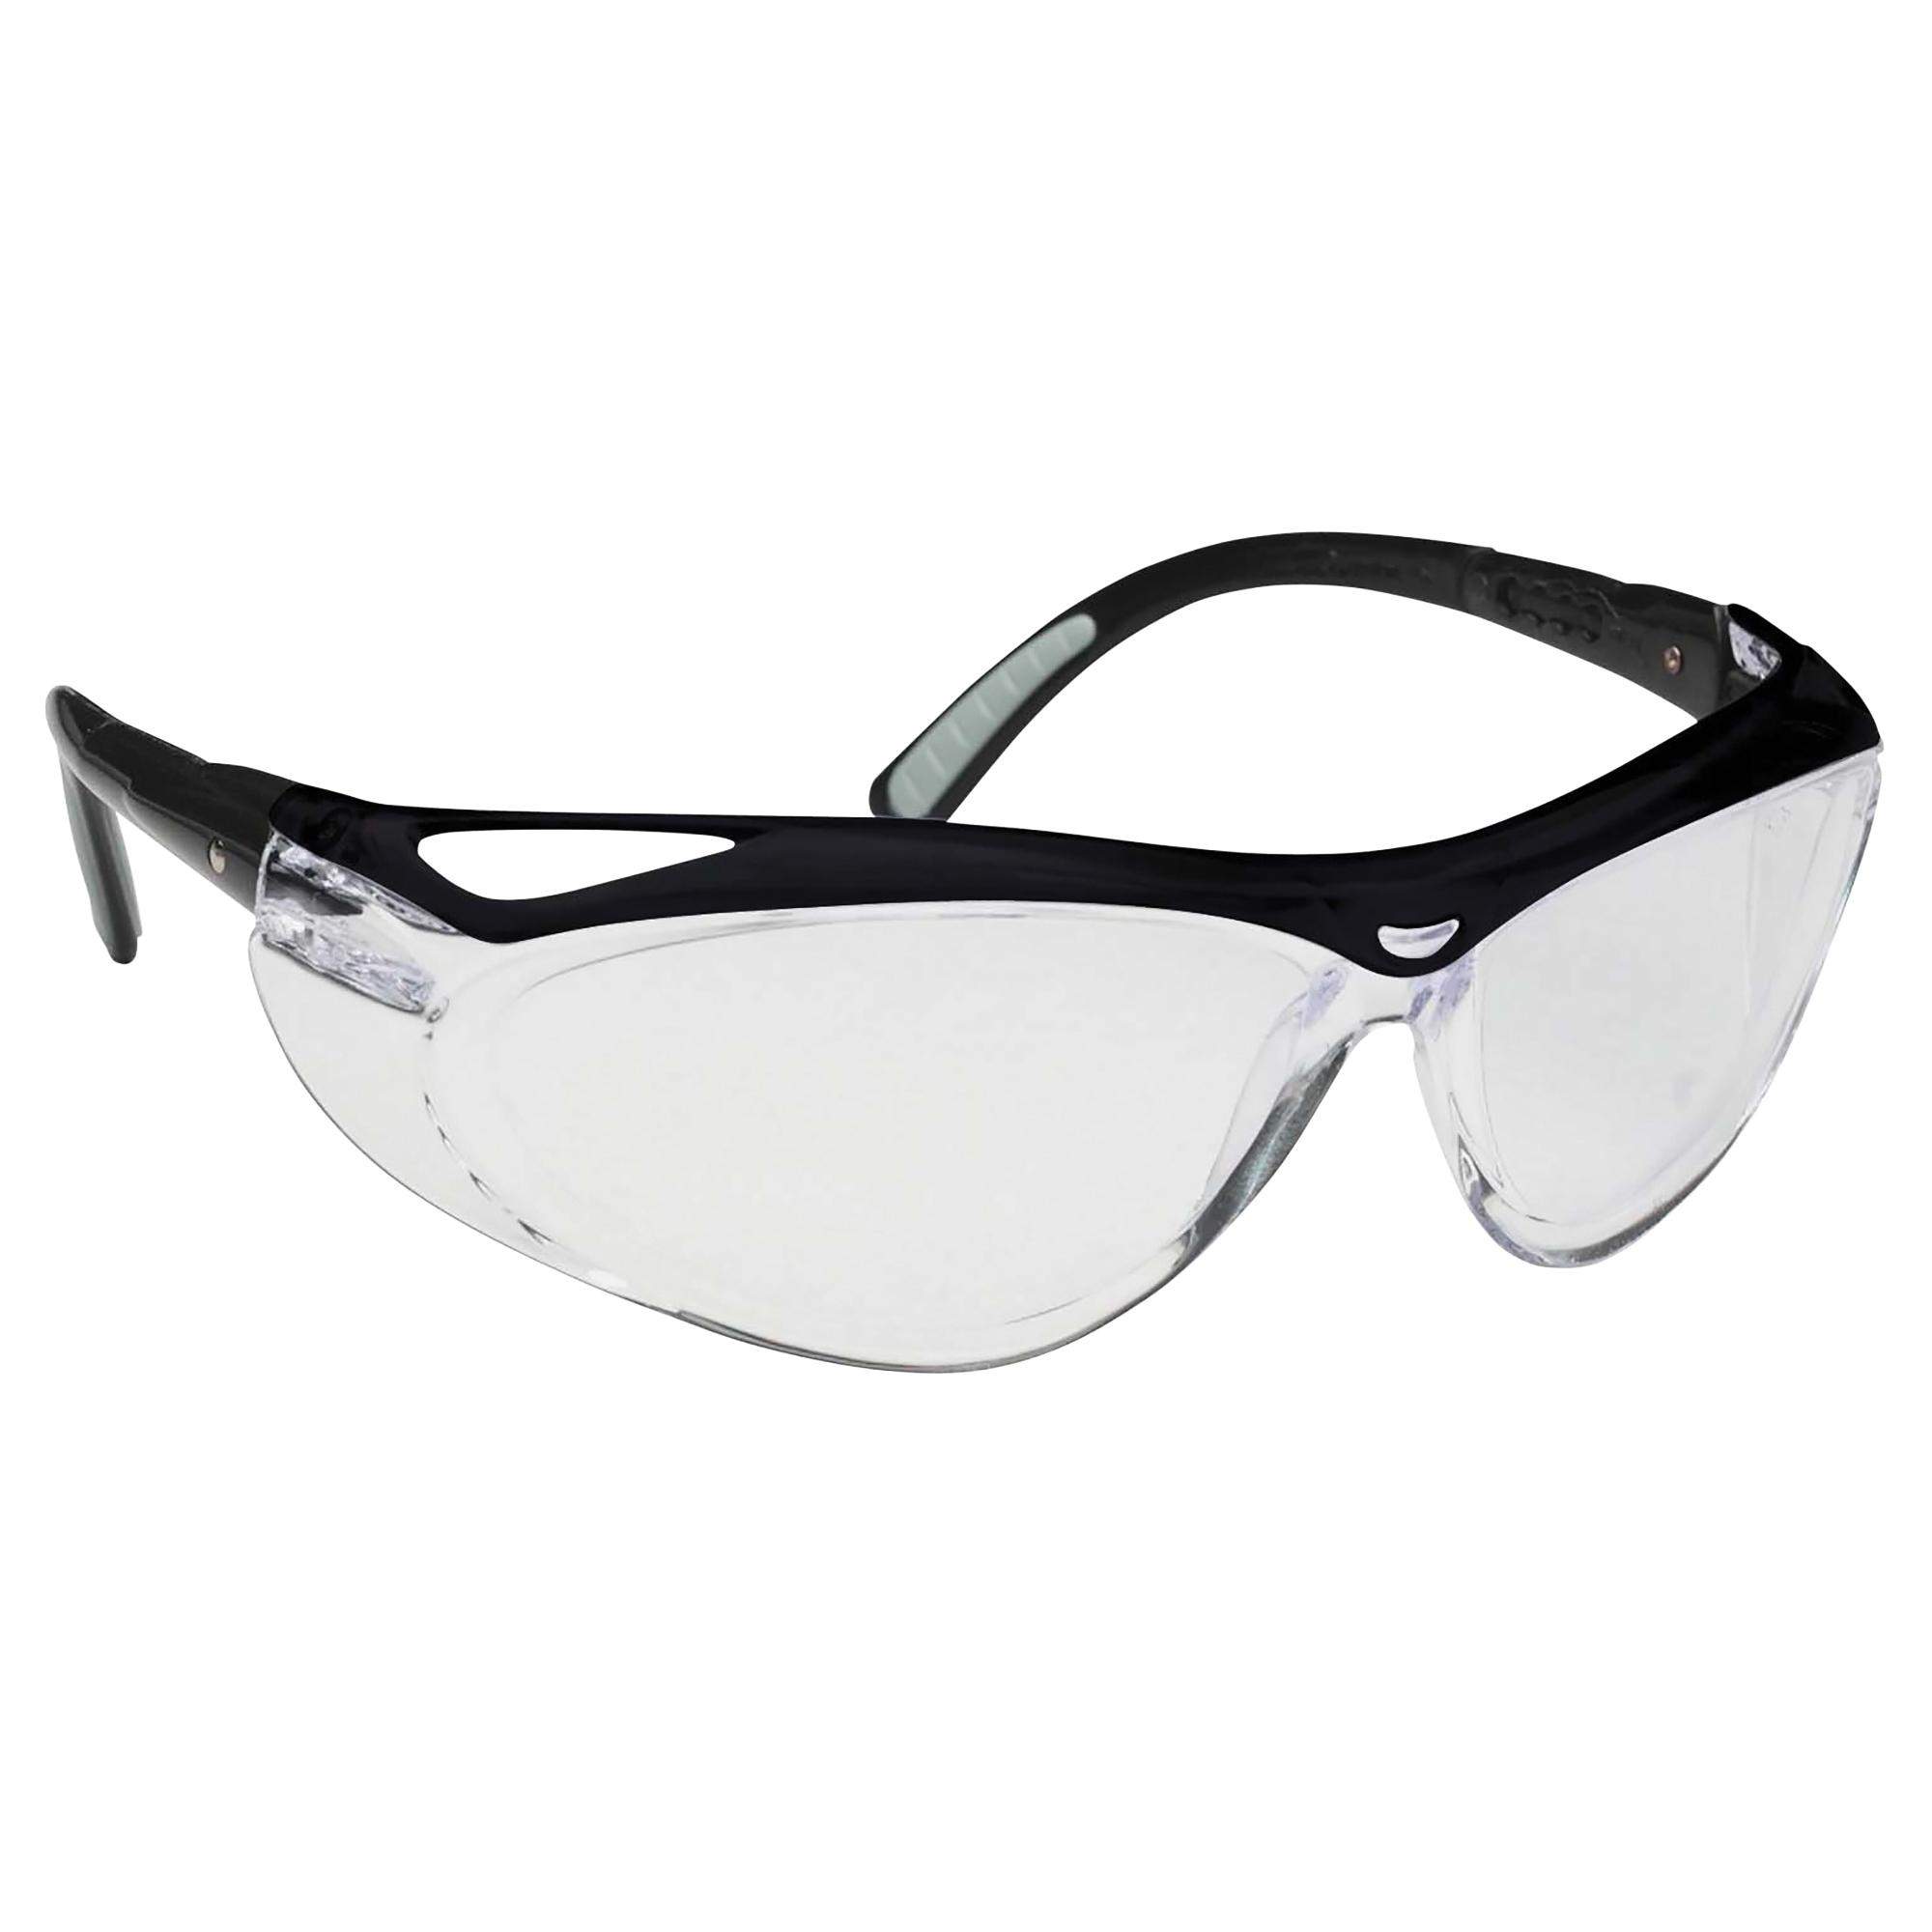 Jackson Safety* 14476 V20 Visio® Lightweight Safety Glasses, Anti-Scratch Indoor/Outdoor Lens, Black Polycarbonate Frame, Polycarbonate Lens, Specifications Met: ANSI Z87.1+2010, CSA Z94.3-2007